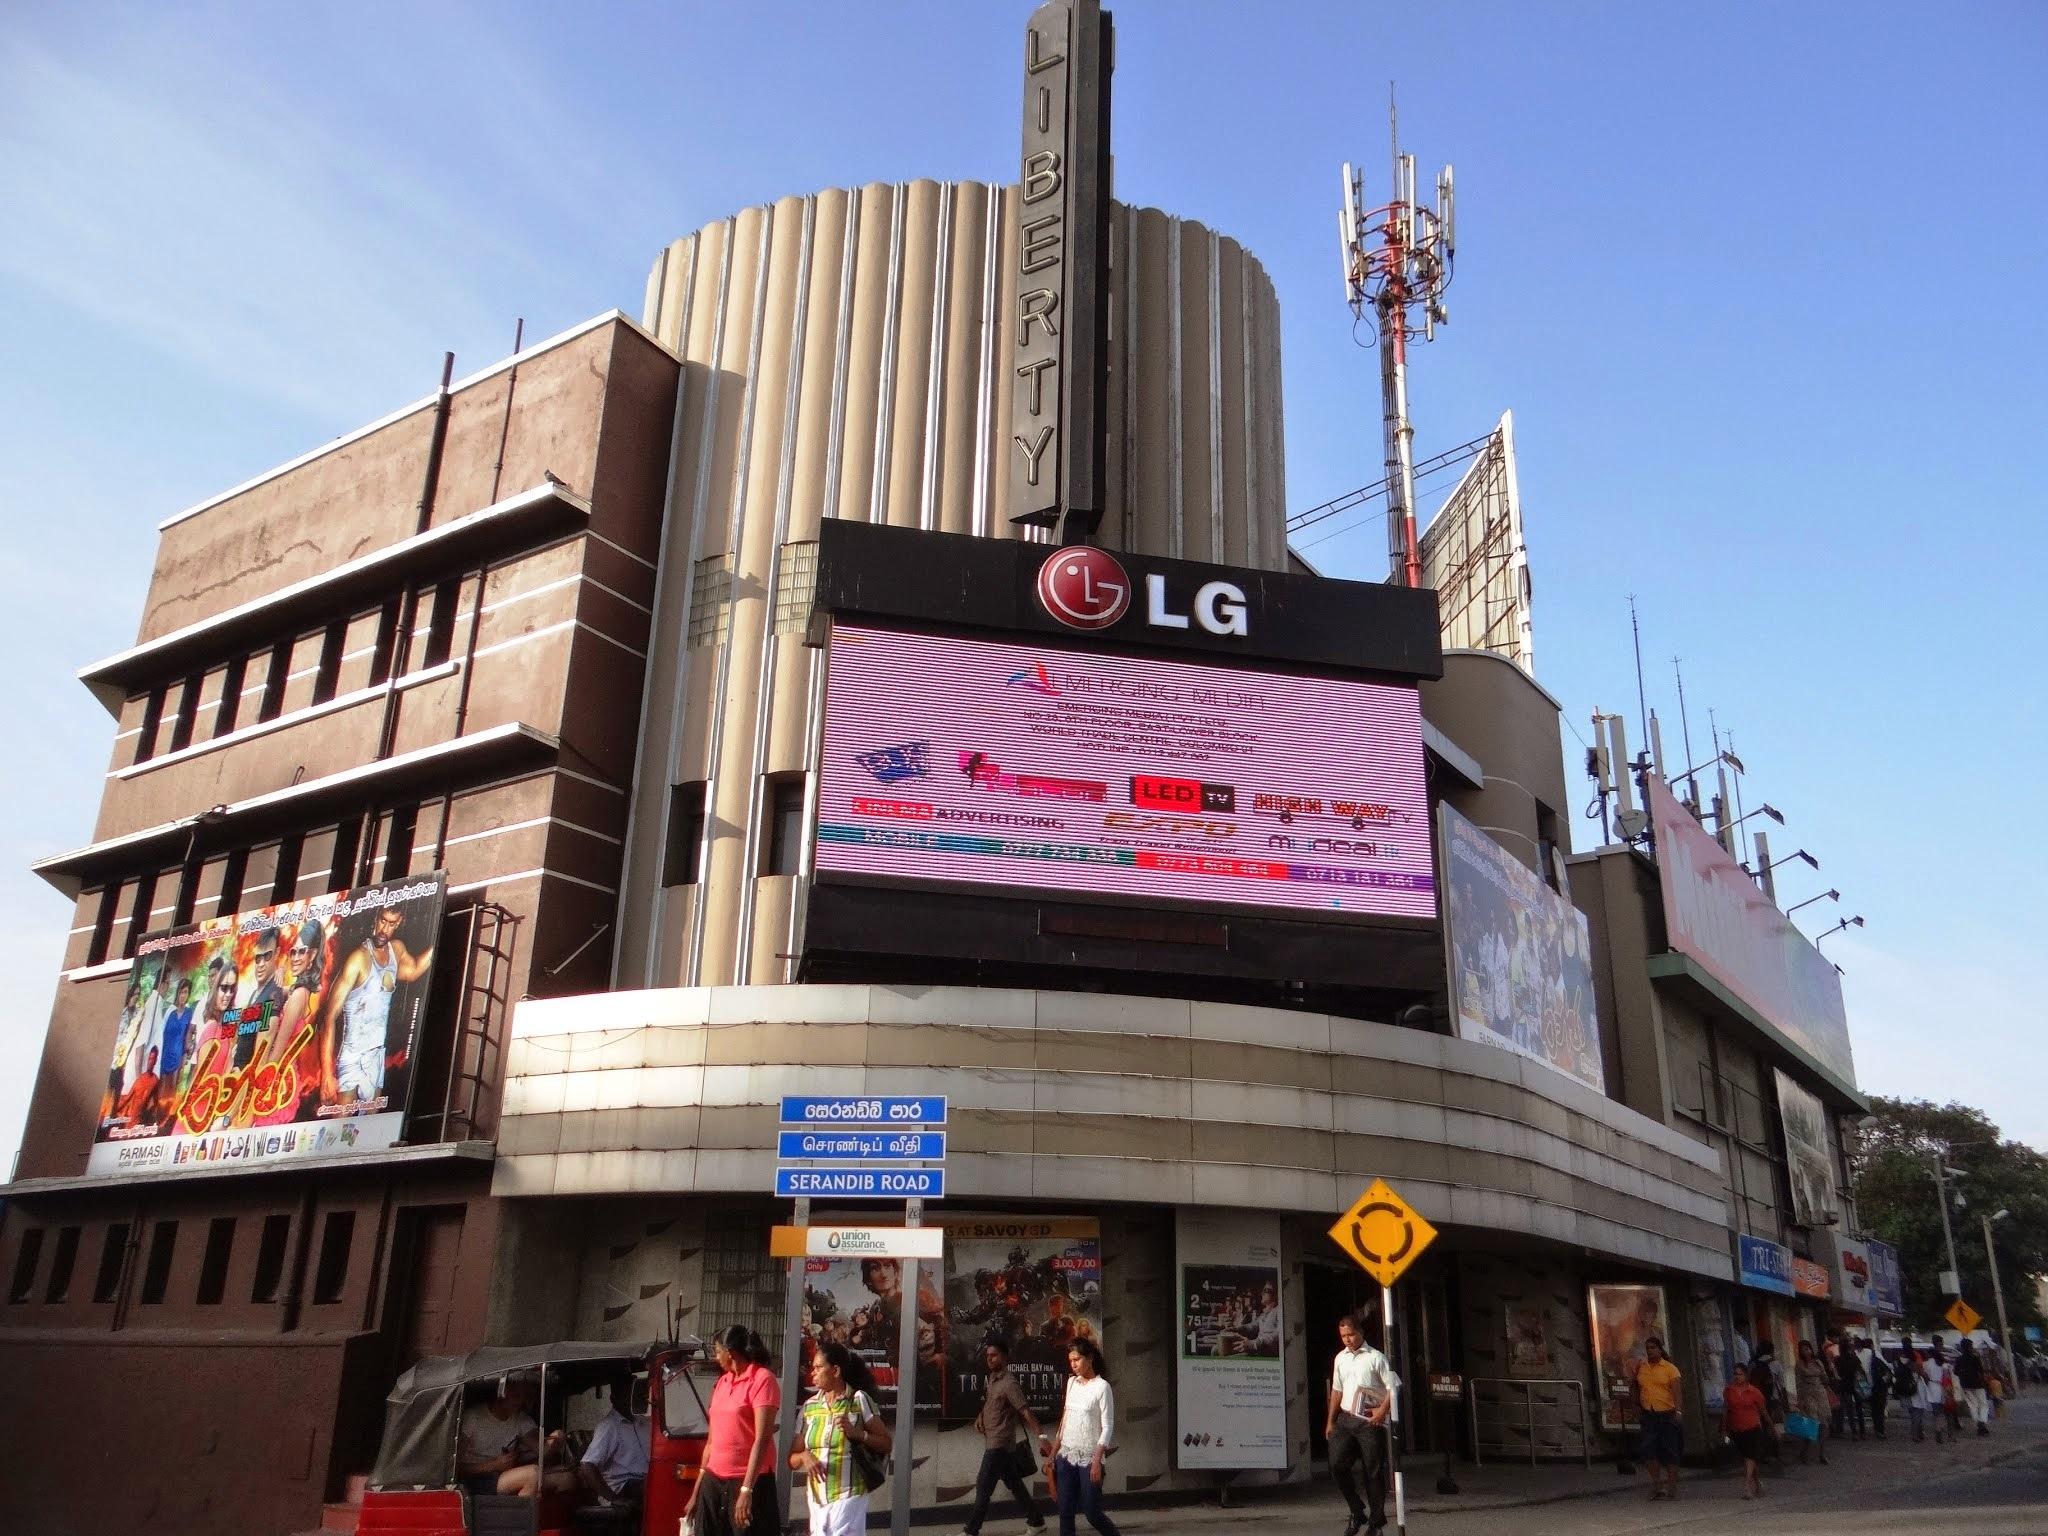 Liberty Cinema is a cinema in Colombo